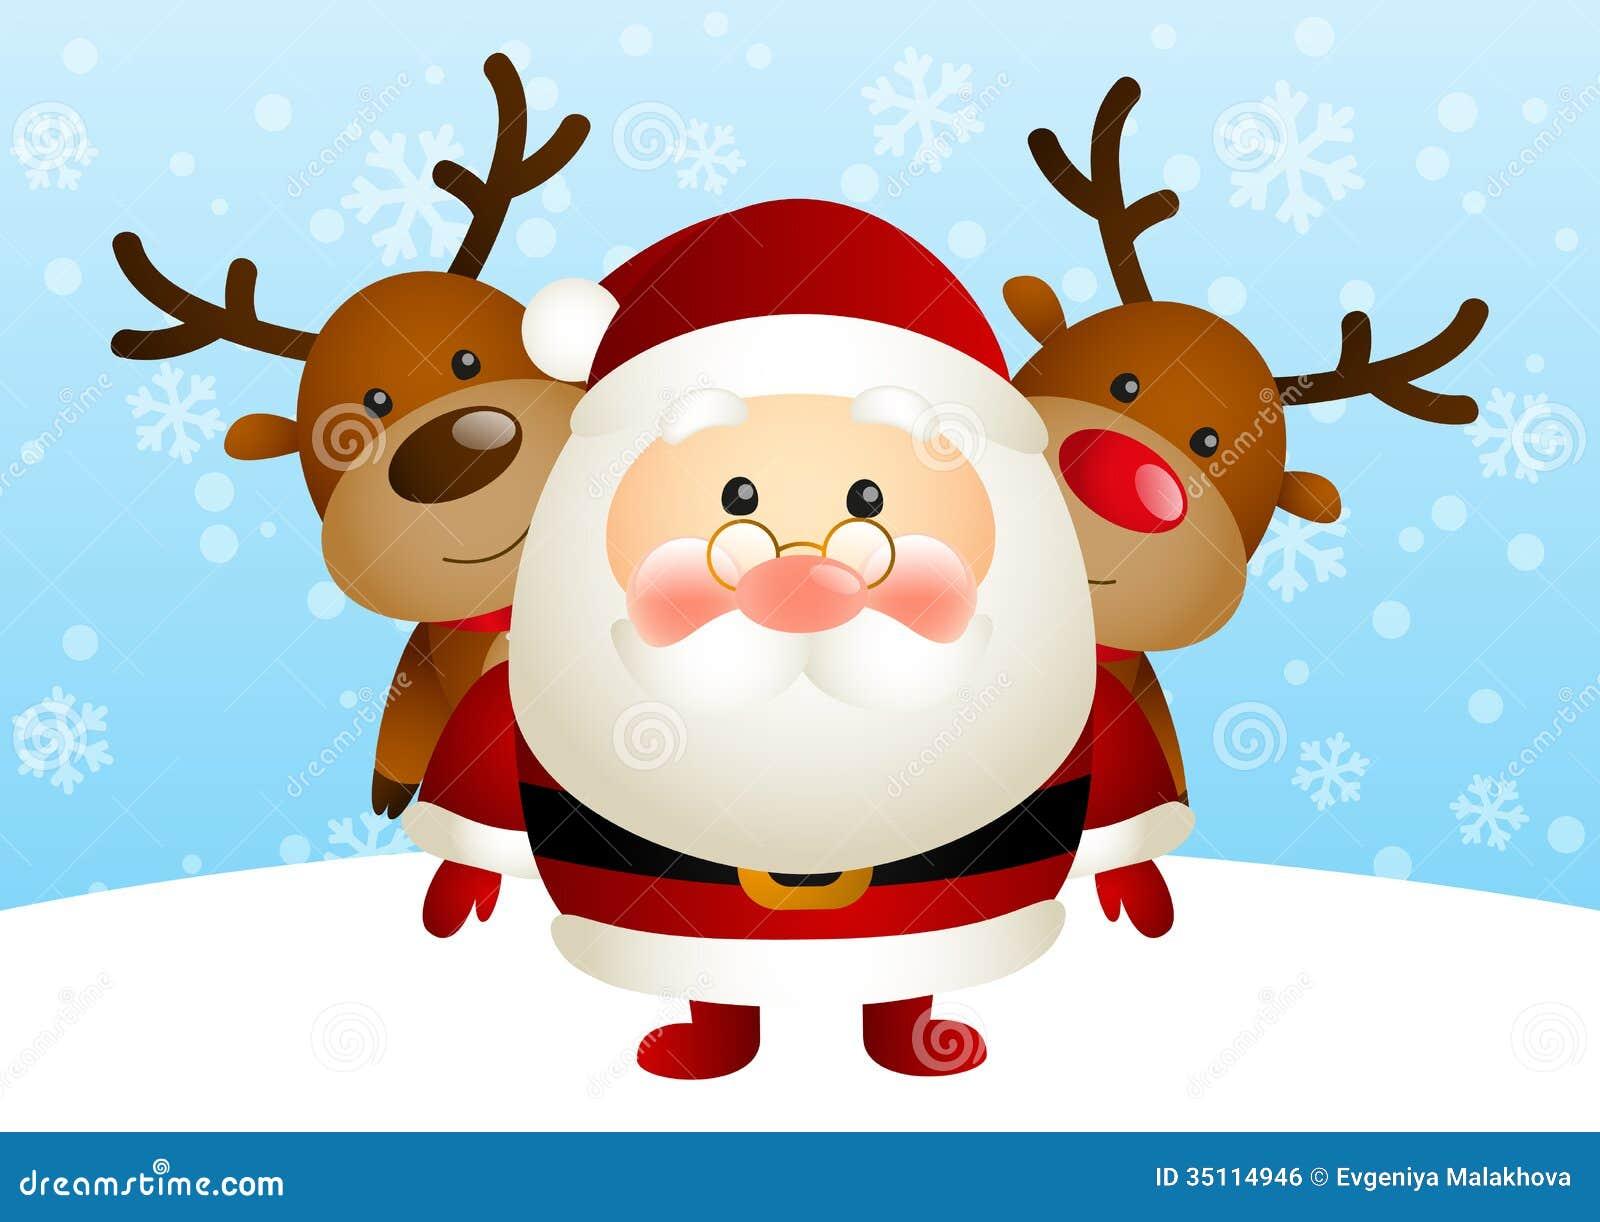 cute santa with deers royalty free stock image image cute baby reindeer clipart cute reindeer clipart